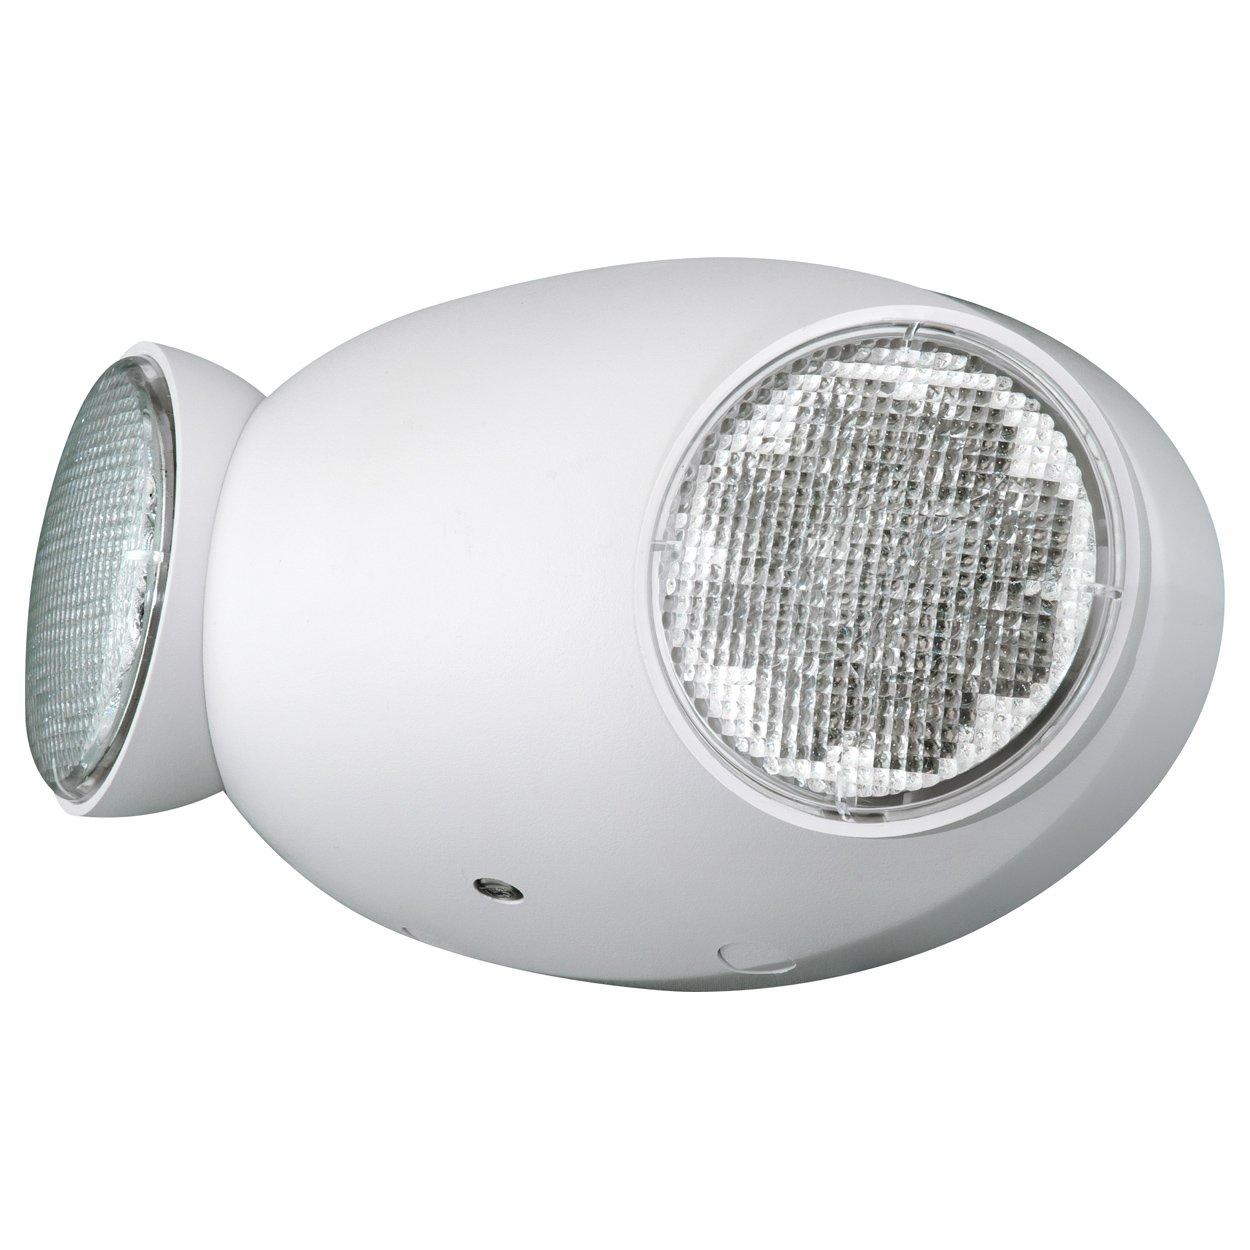 Compass CU2 Hubbell Lighting LED 2 Head Emergency Light